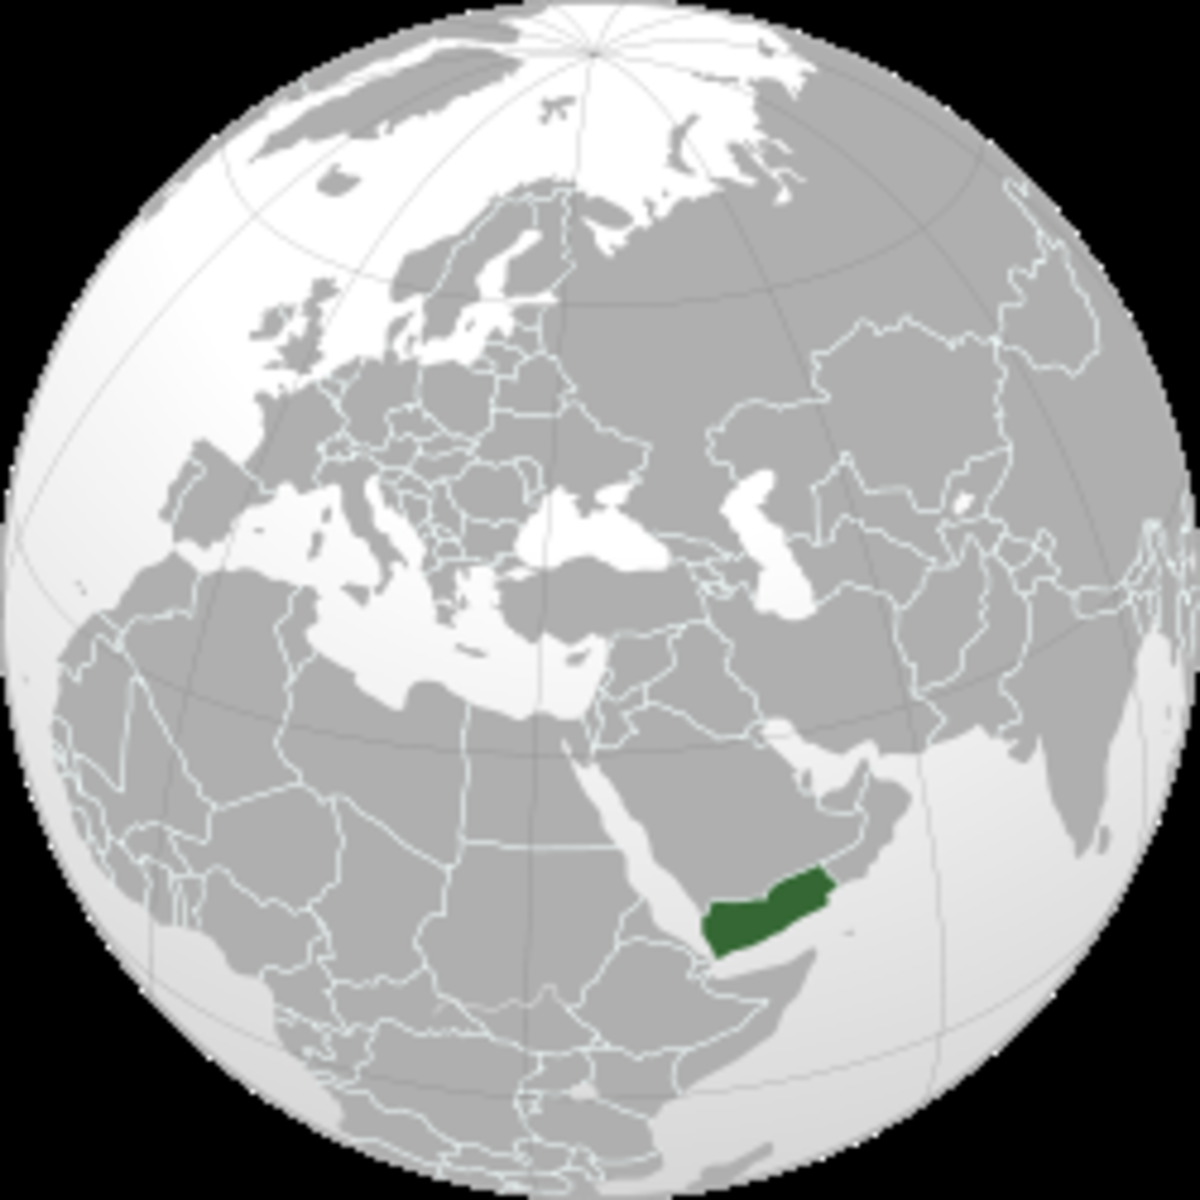 y-is-for-yemen